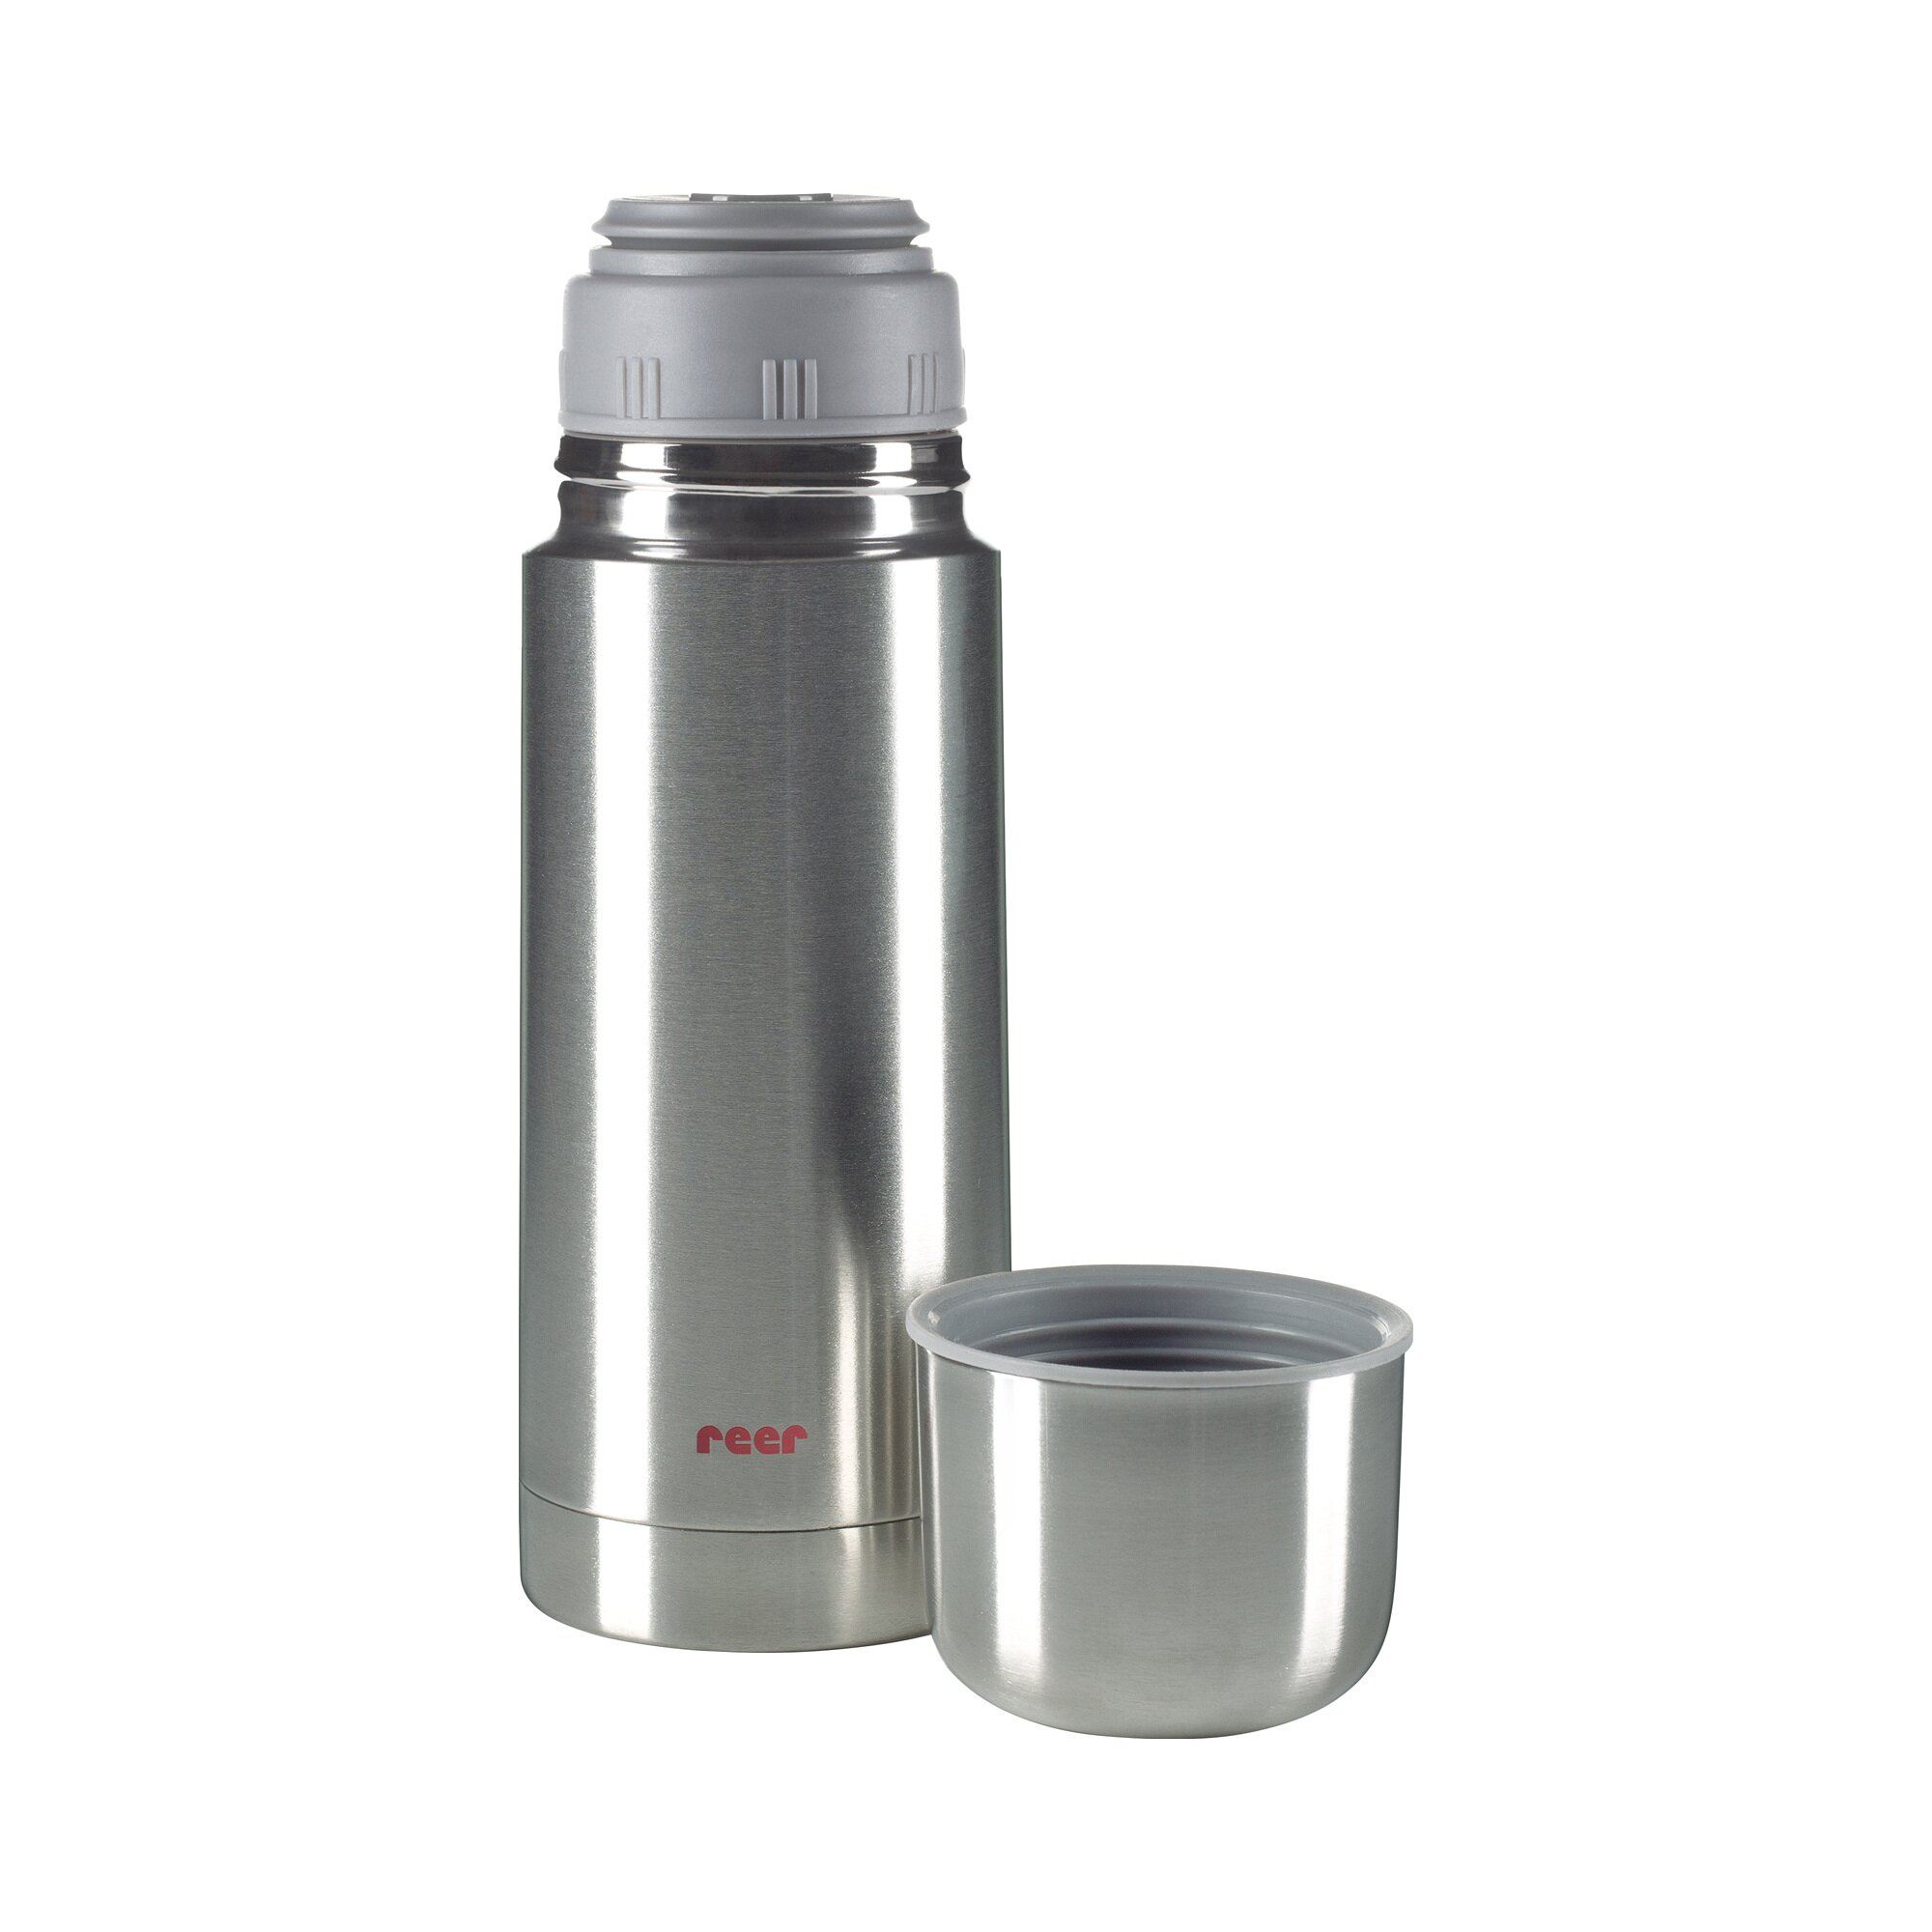 Reer Edelstahl-Thermosflasche